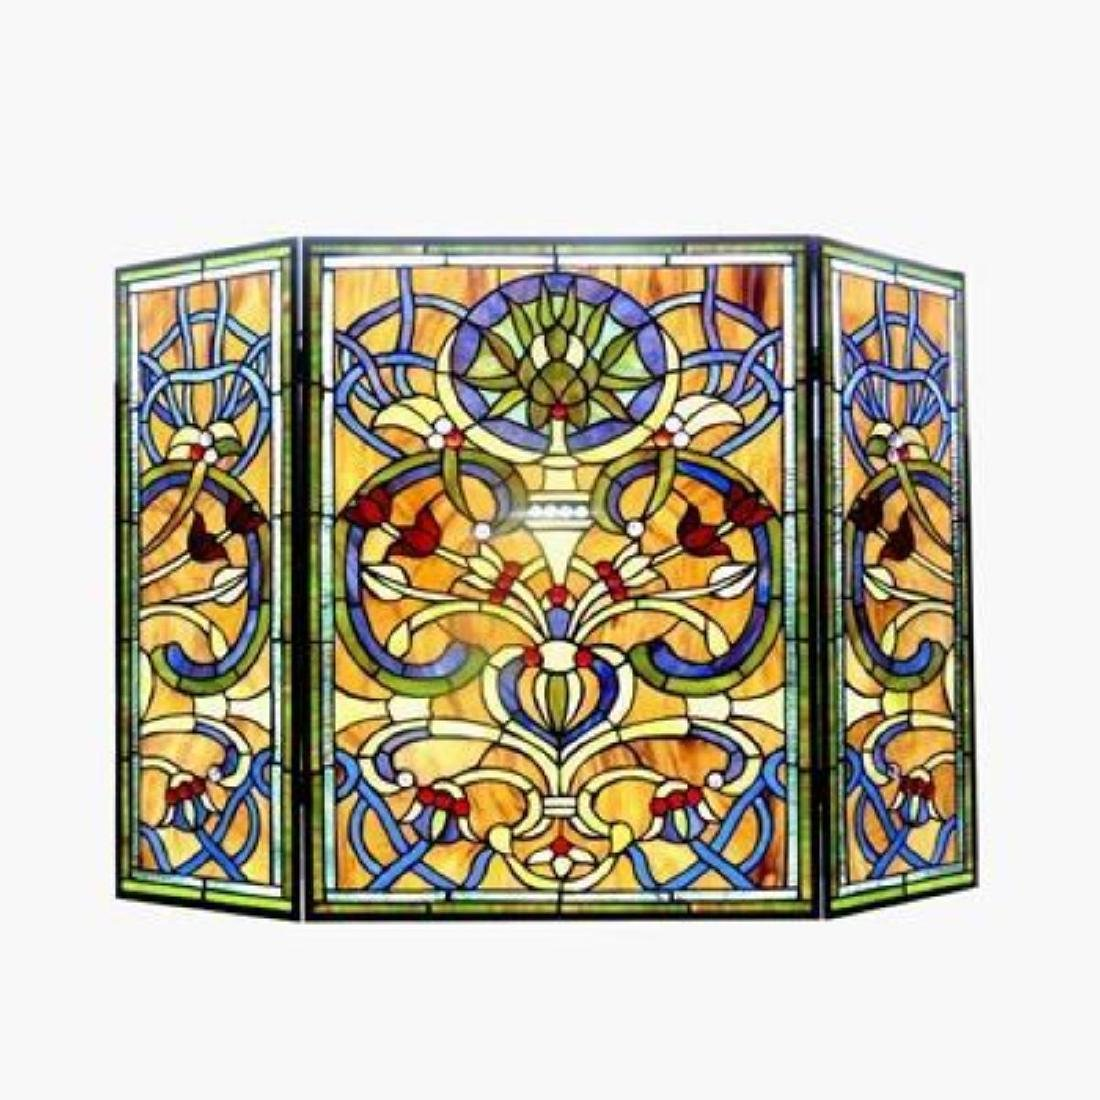 Tiffany-glass Victorian 3pcs Folding Fireplace Screen